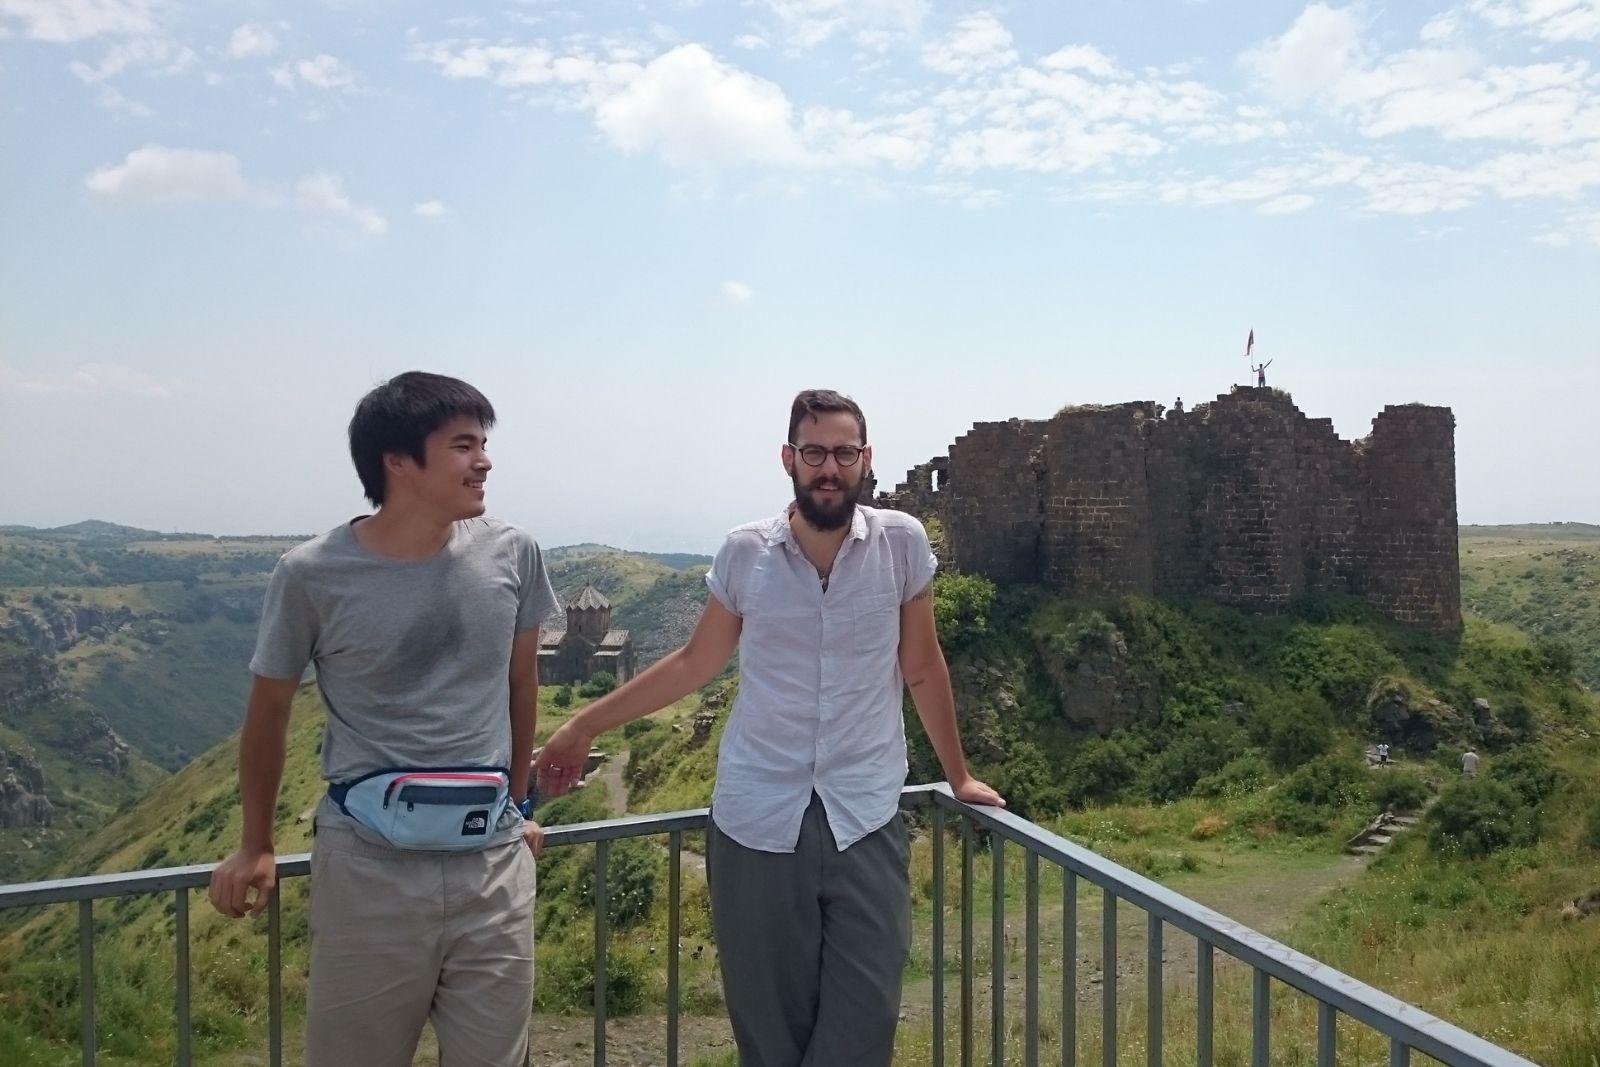 Participants of Armenian language summer school 2016 at Amberd fortress. From left to right: Chihiro Taguchi,Nicholas Matheou